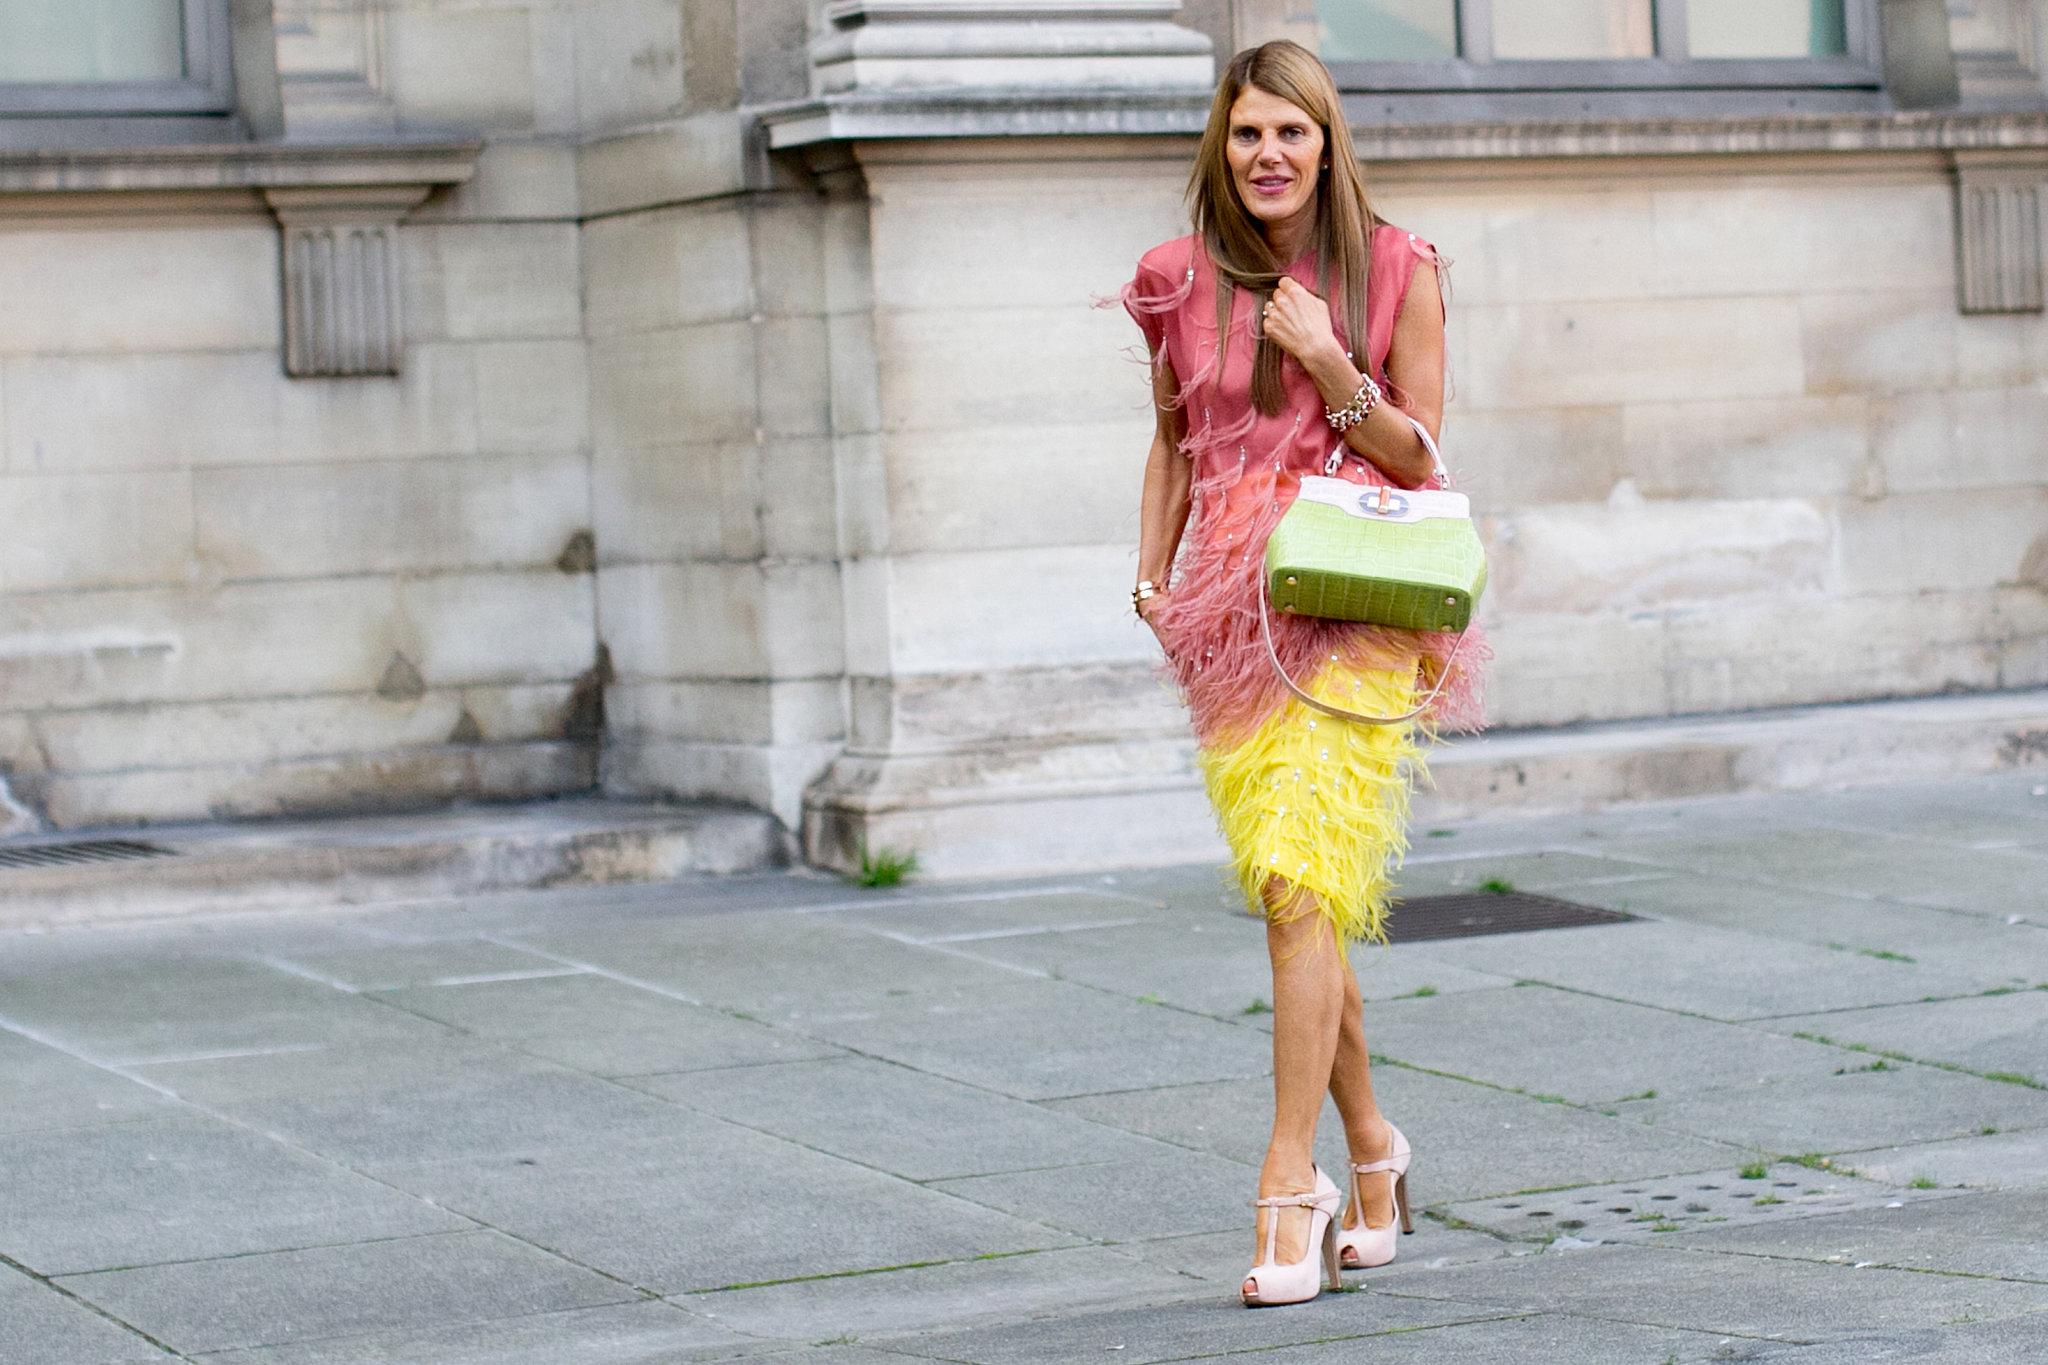 Anna Dello Russo ruled the sidewalk in multicolored feathers.